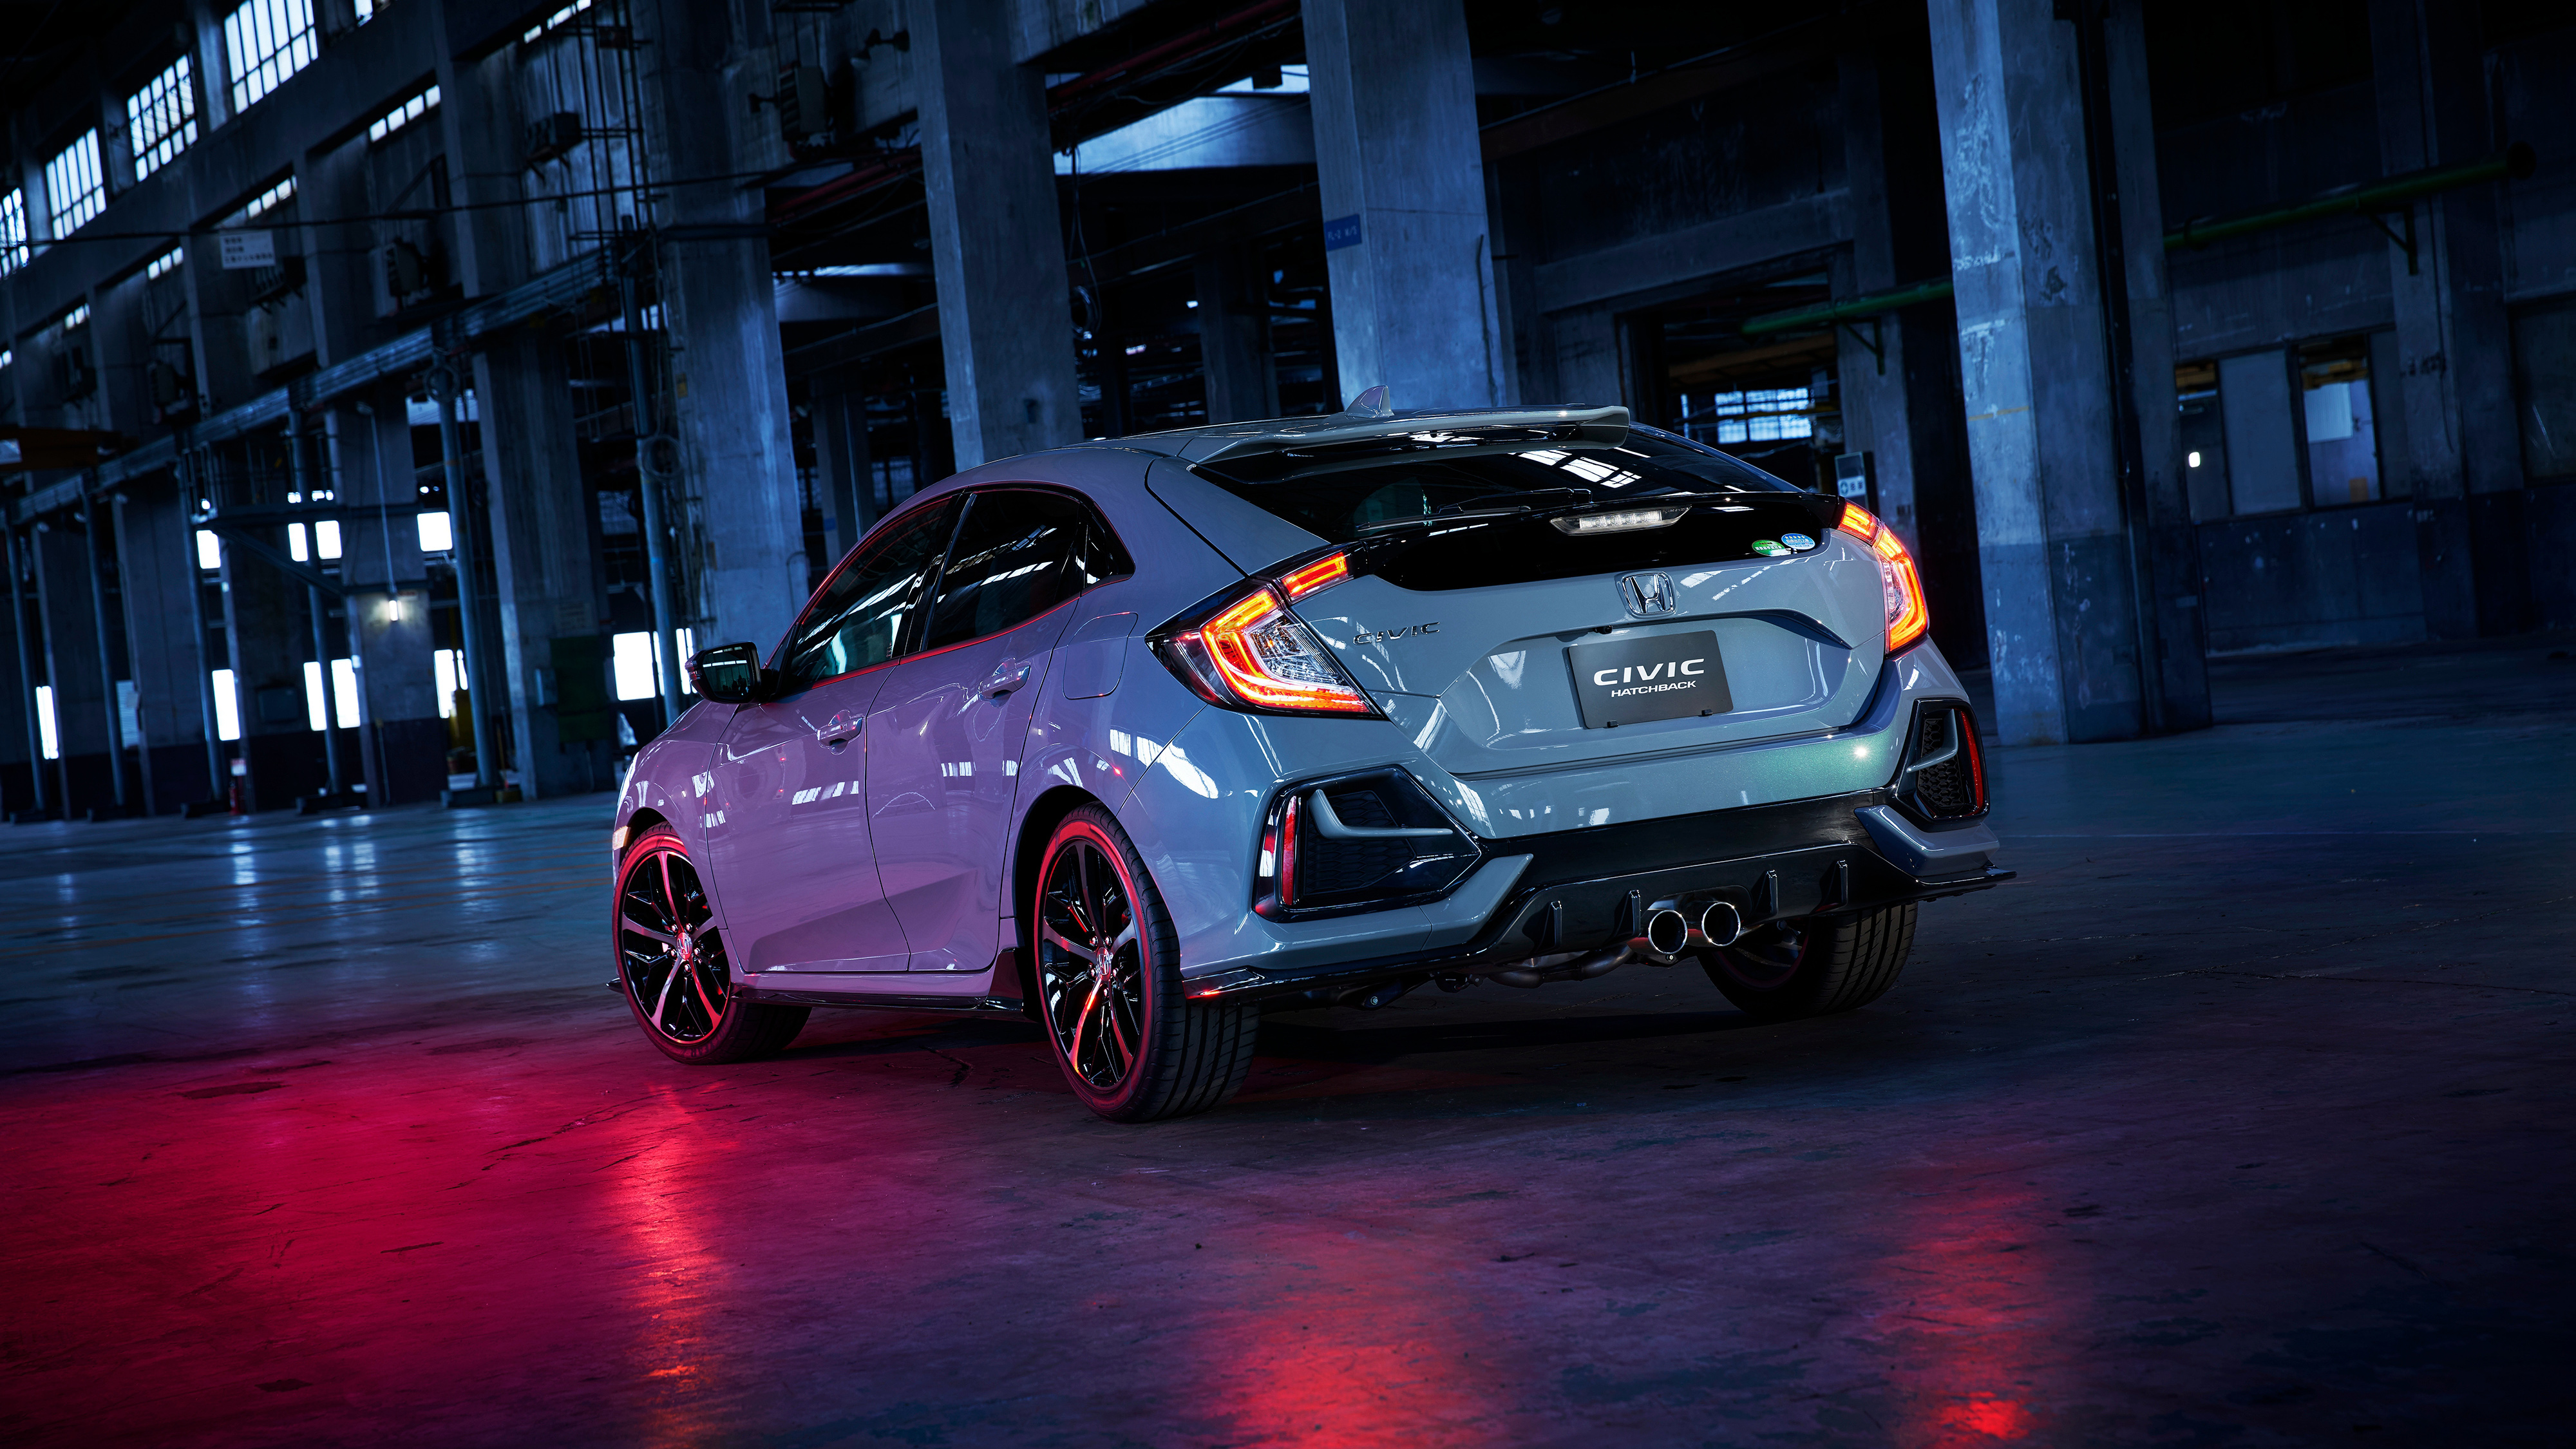 Honda Civic Hatchback 2019 4K Wallpaper   HD Car ...